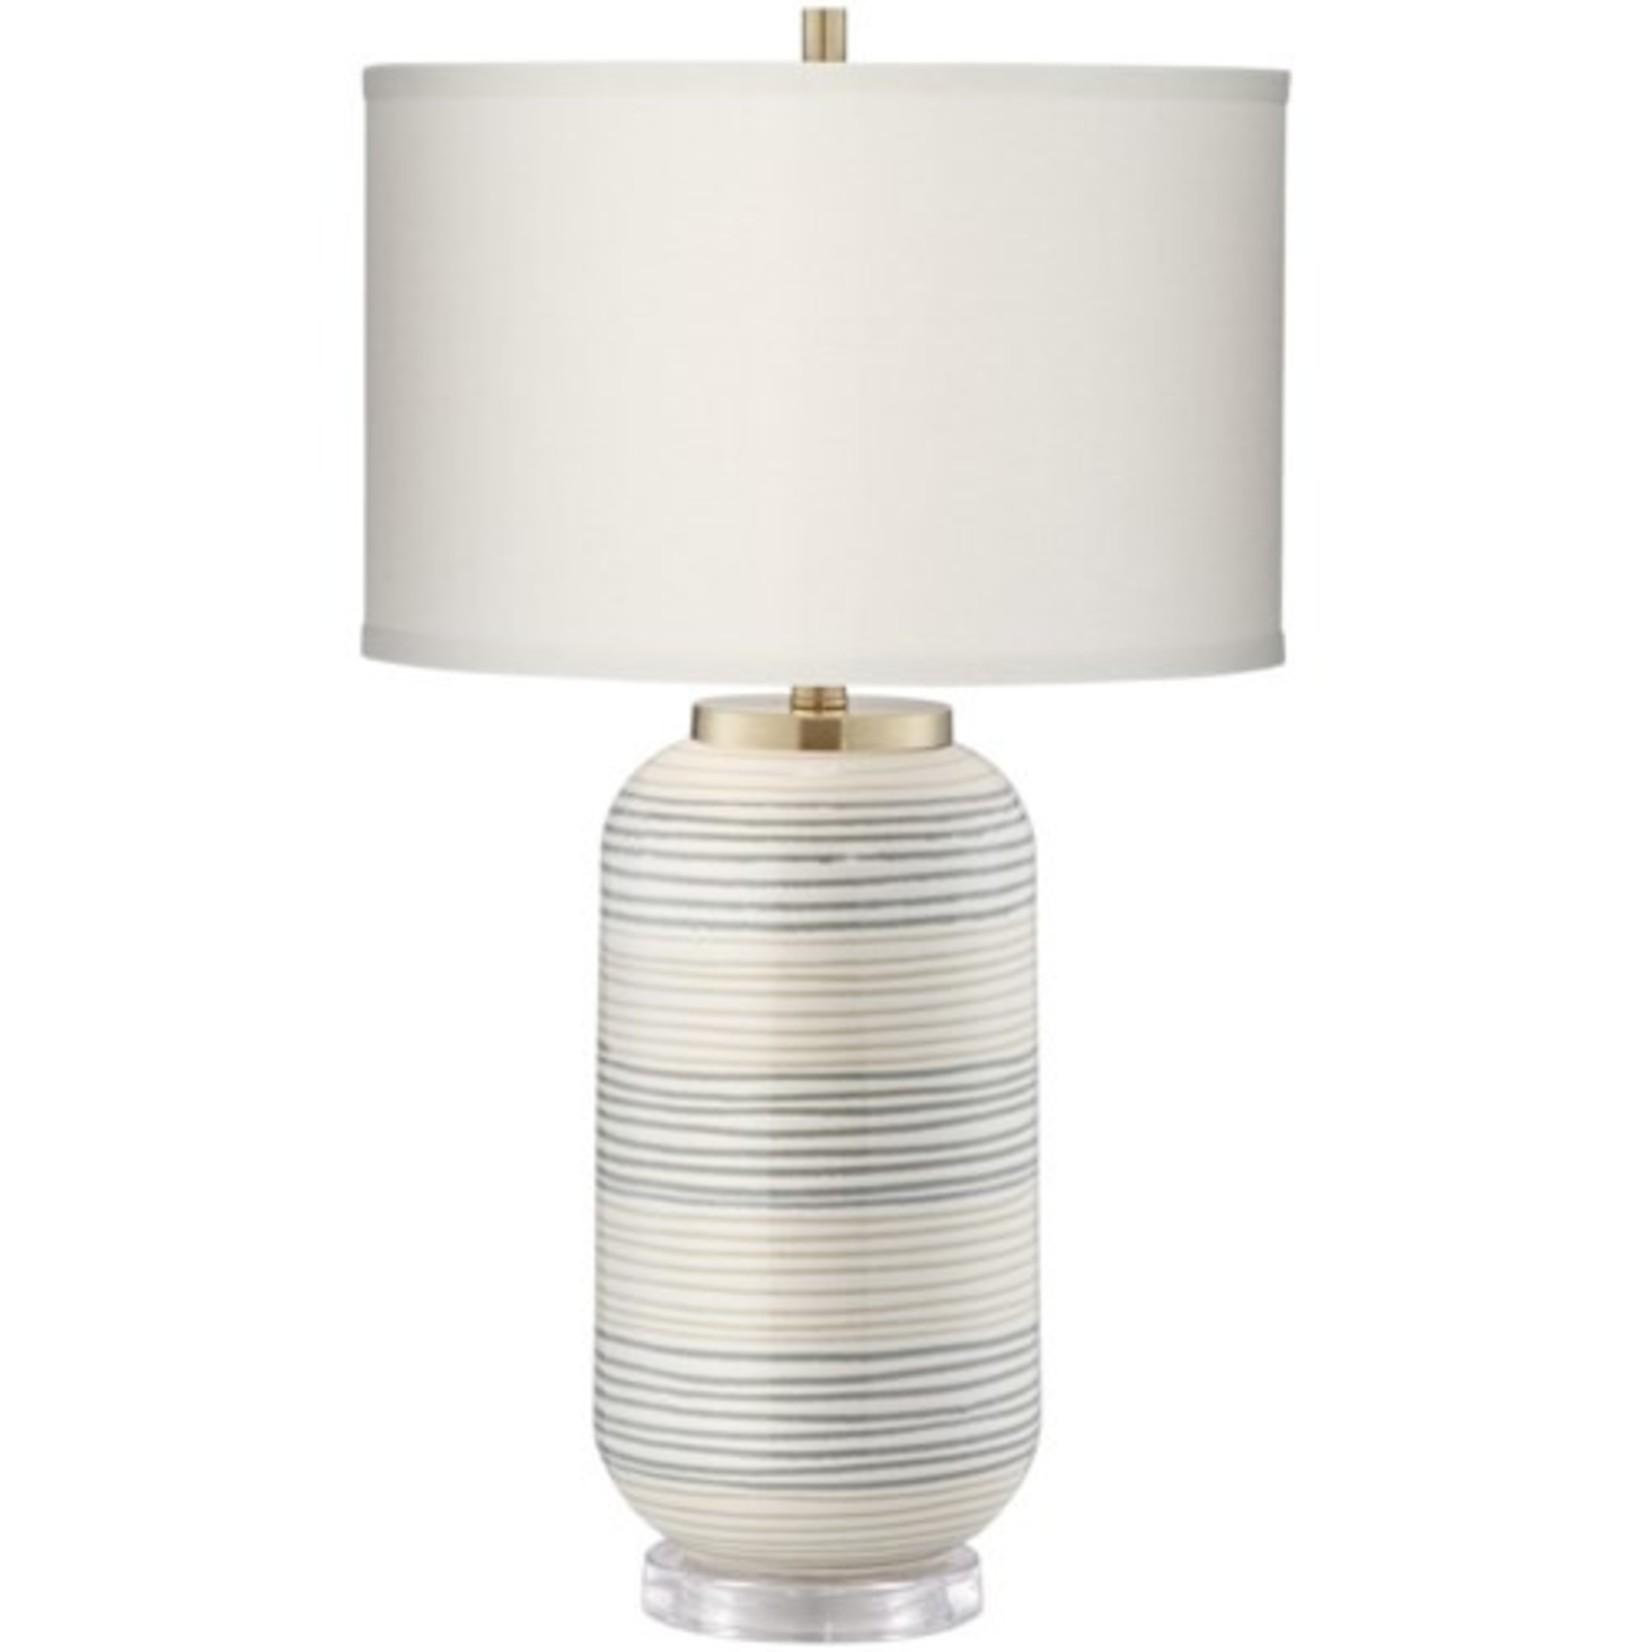 Pacific Coast Lighting Striped Adler Table Lamp